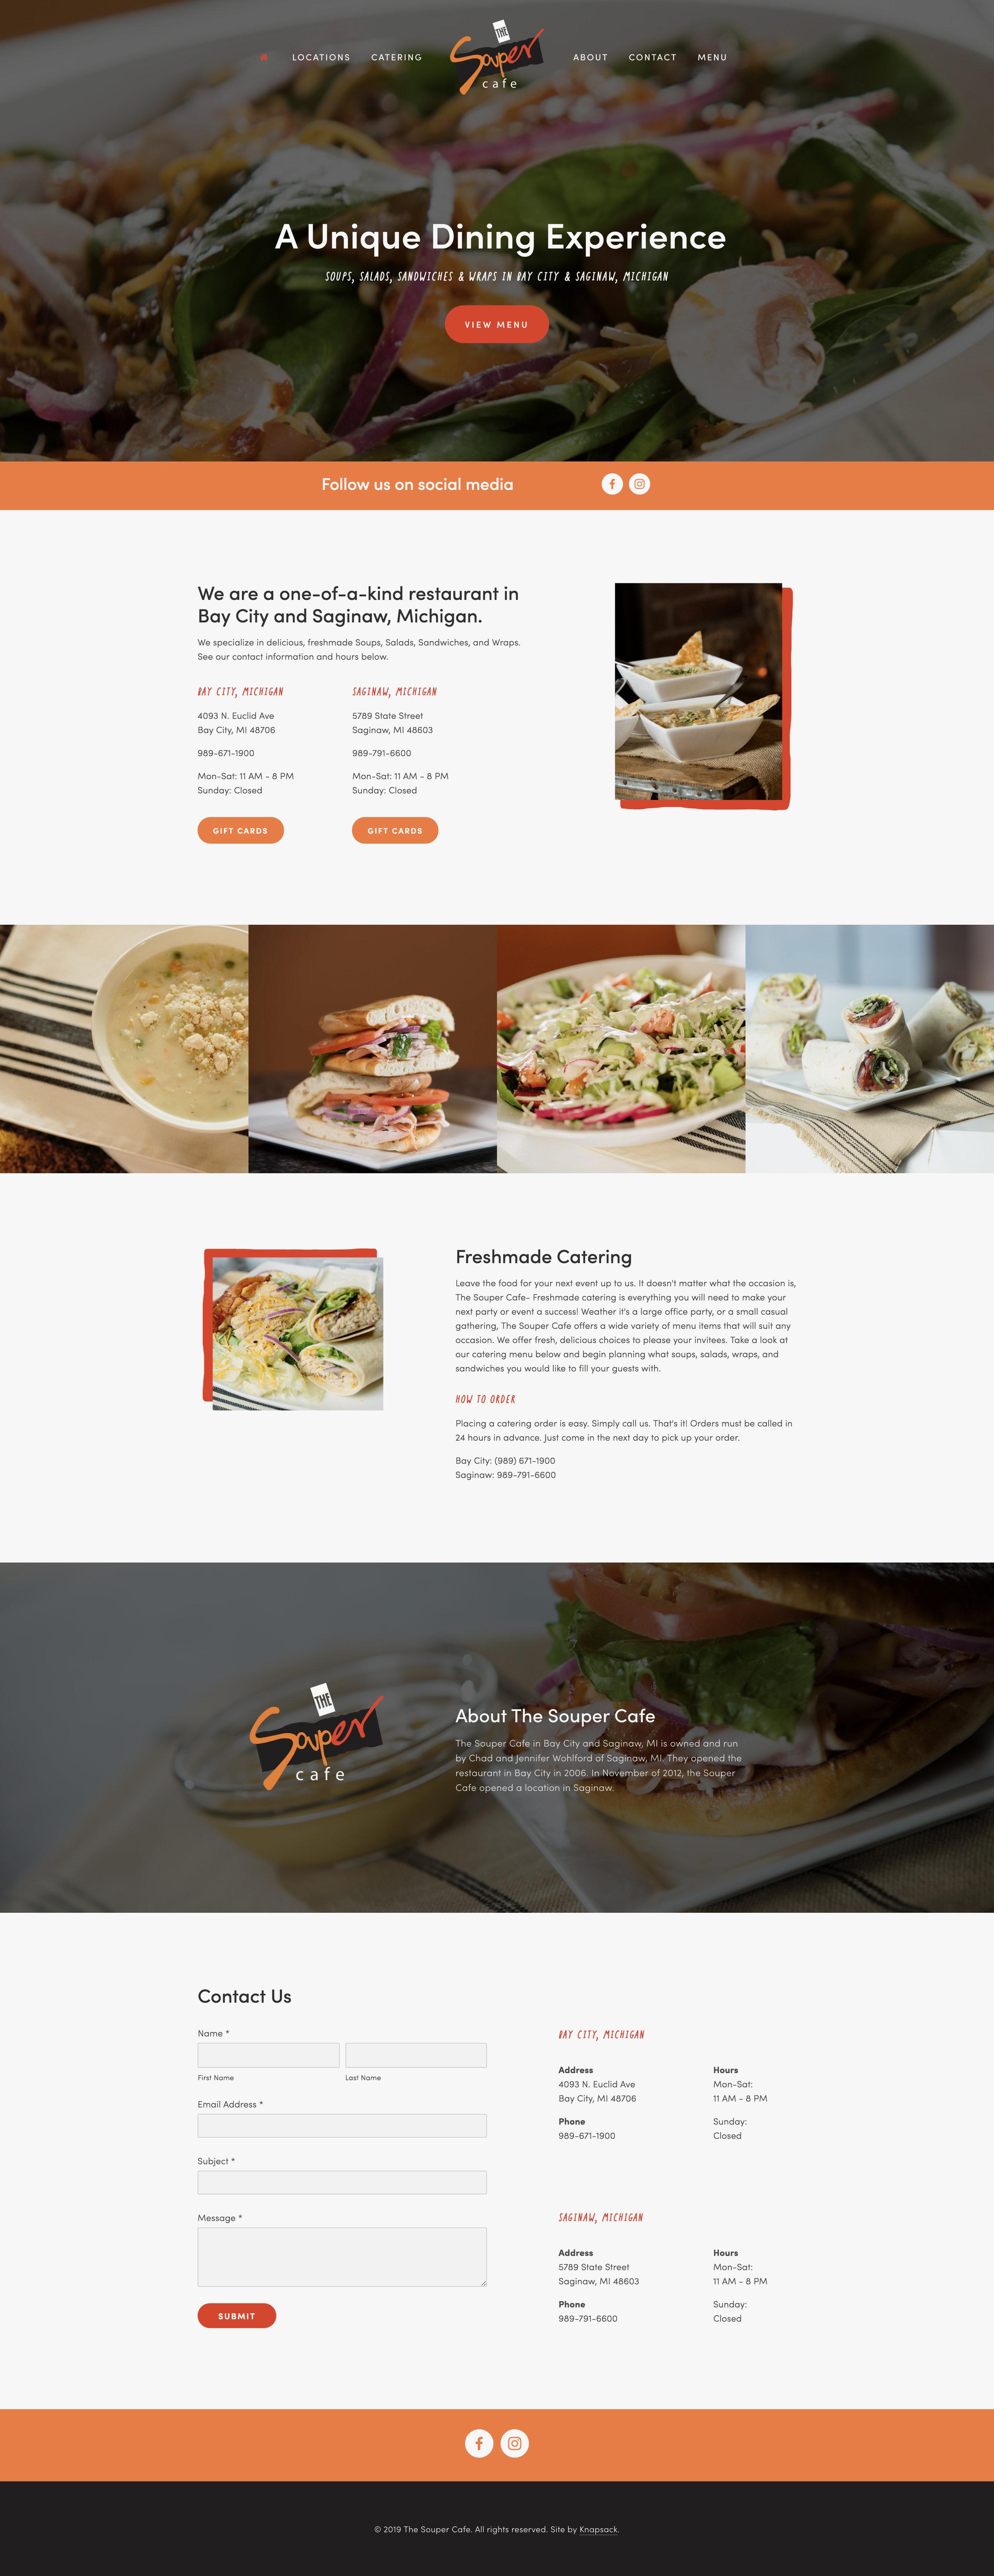 Souper-Cafe-Home-Macbook-Overlay.jpg